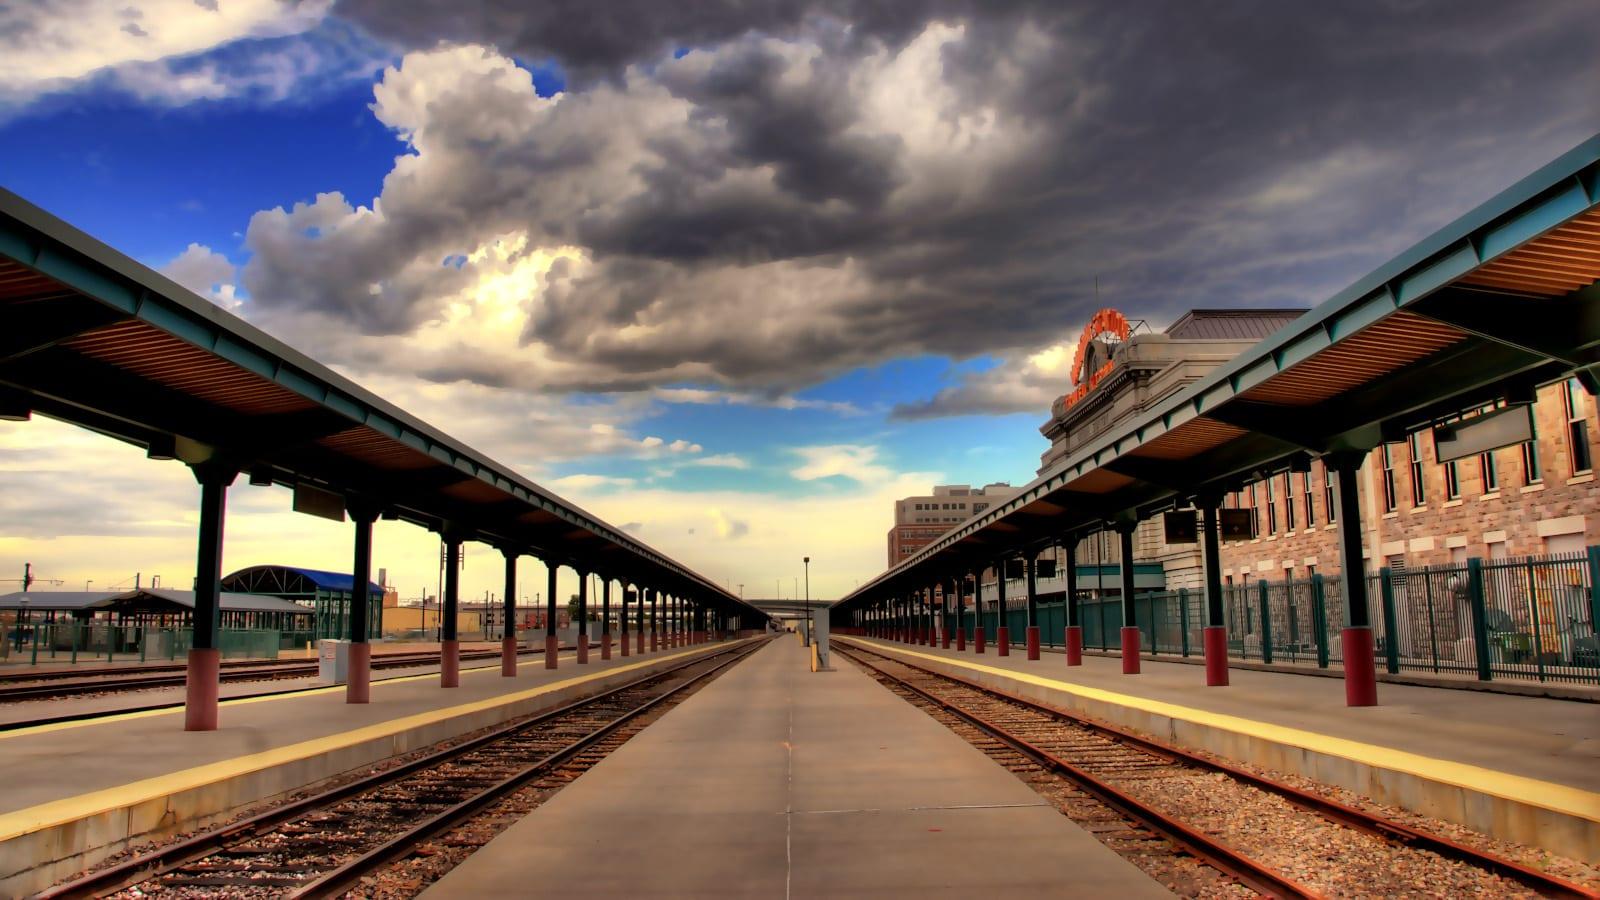 Travel Destination Denver Union Station Railroad Train Tracks